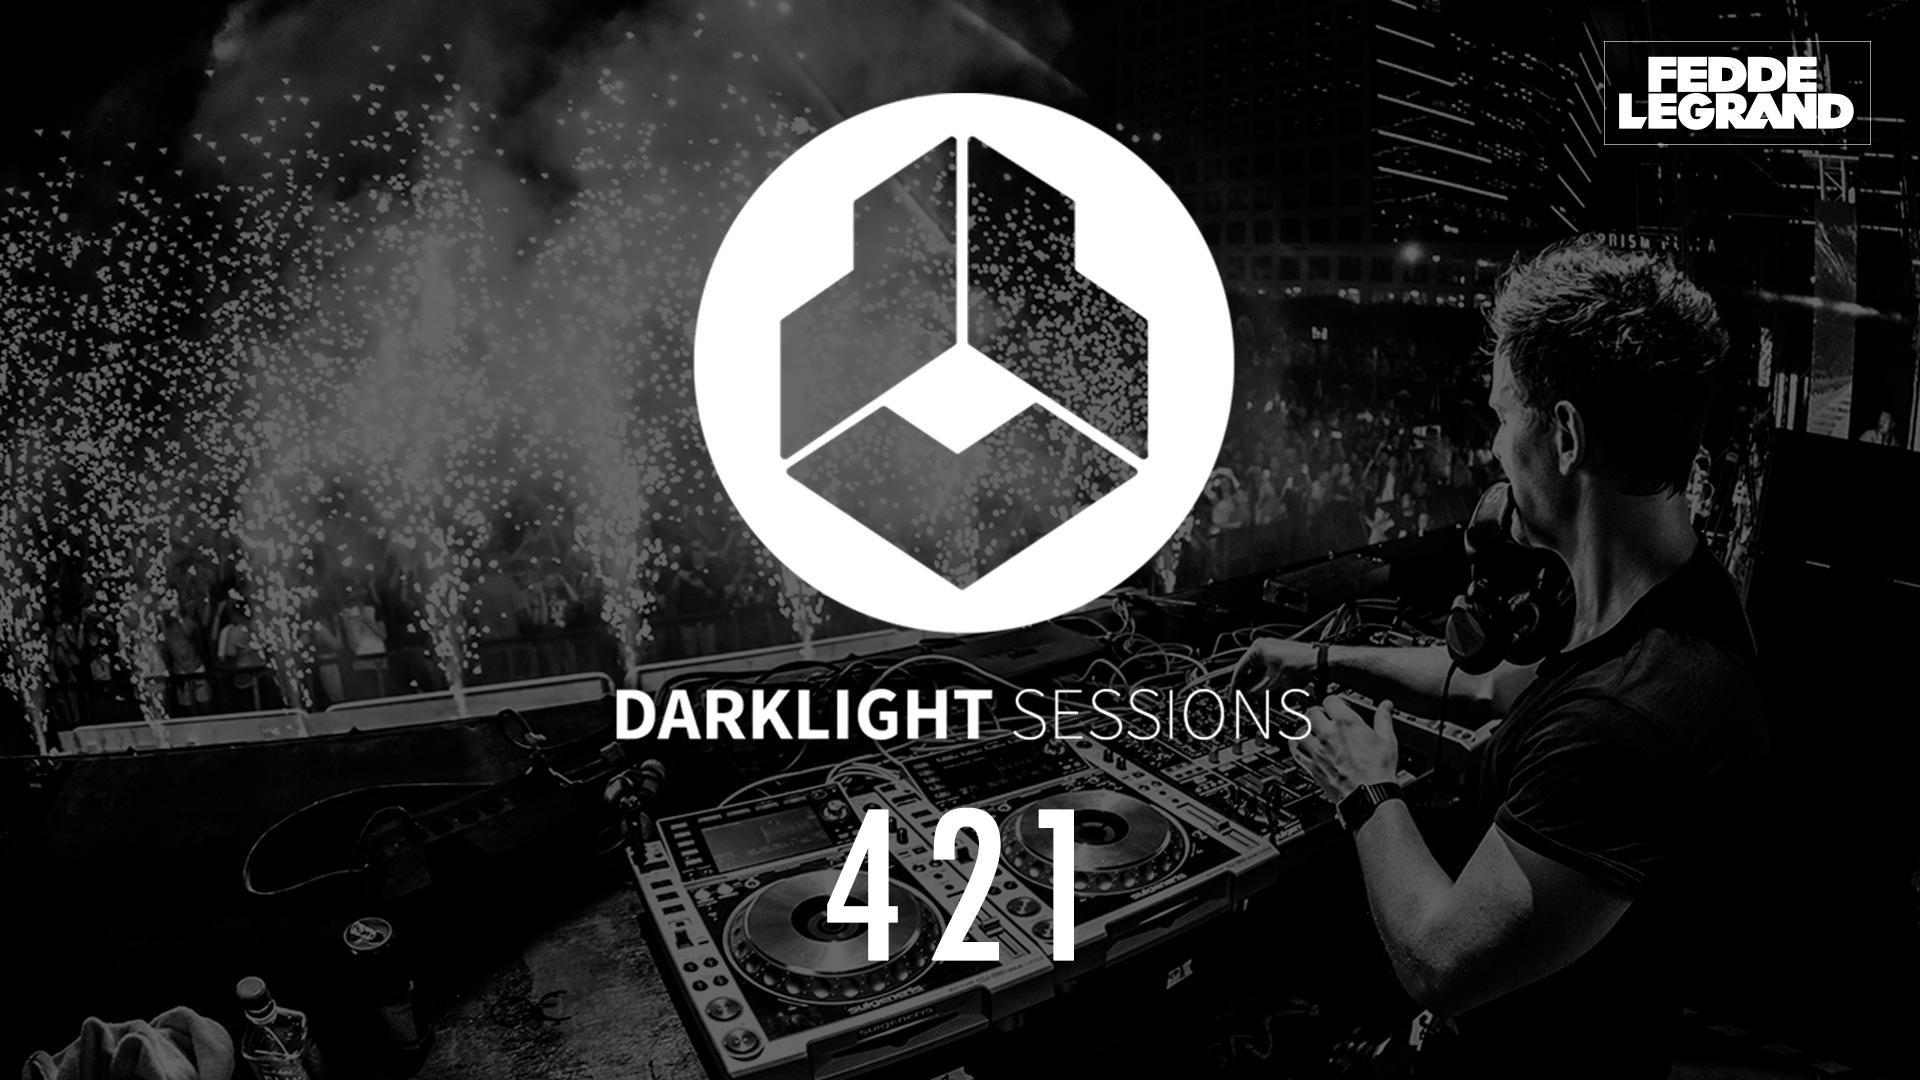 Darklight Sessions 421